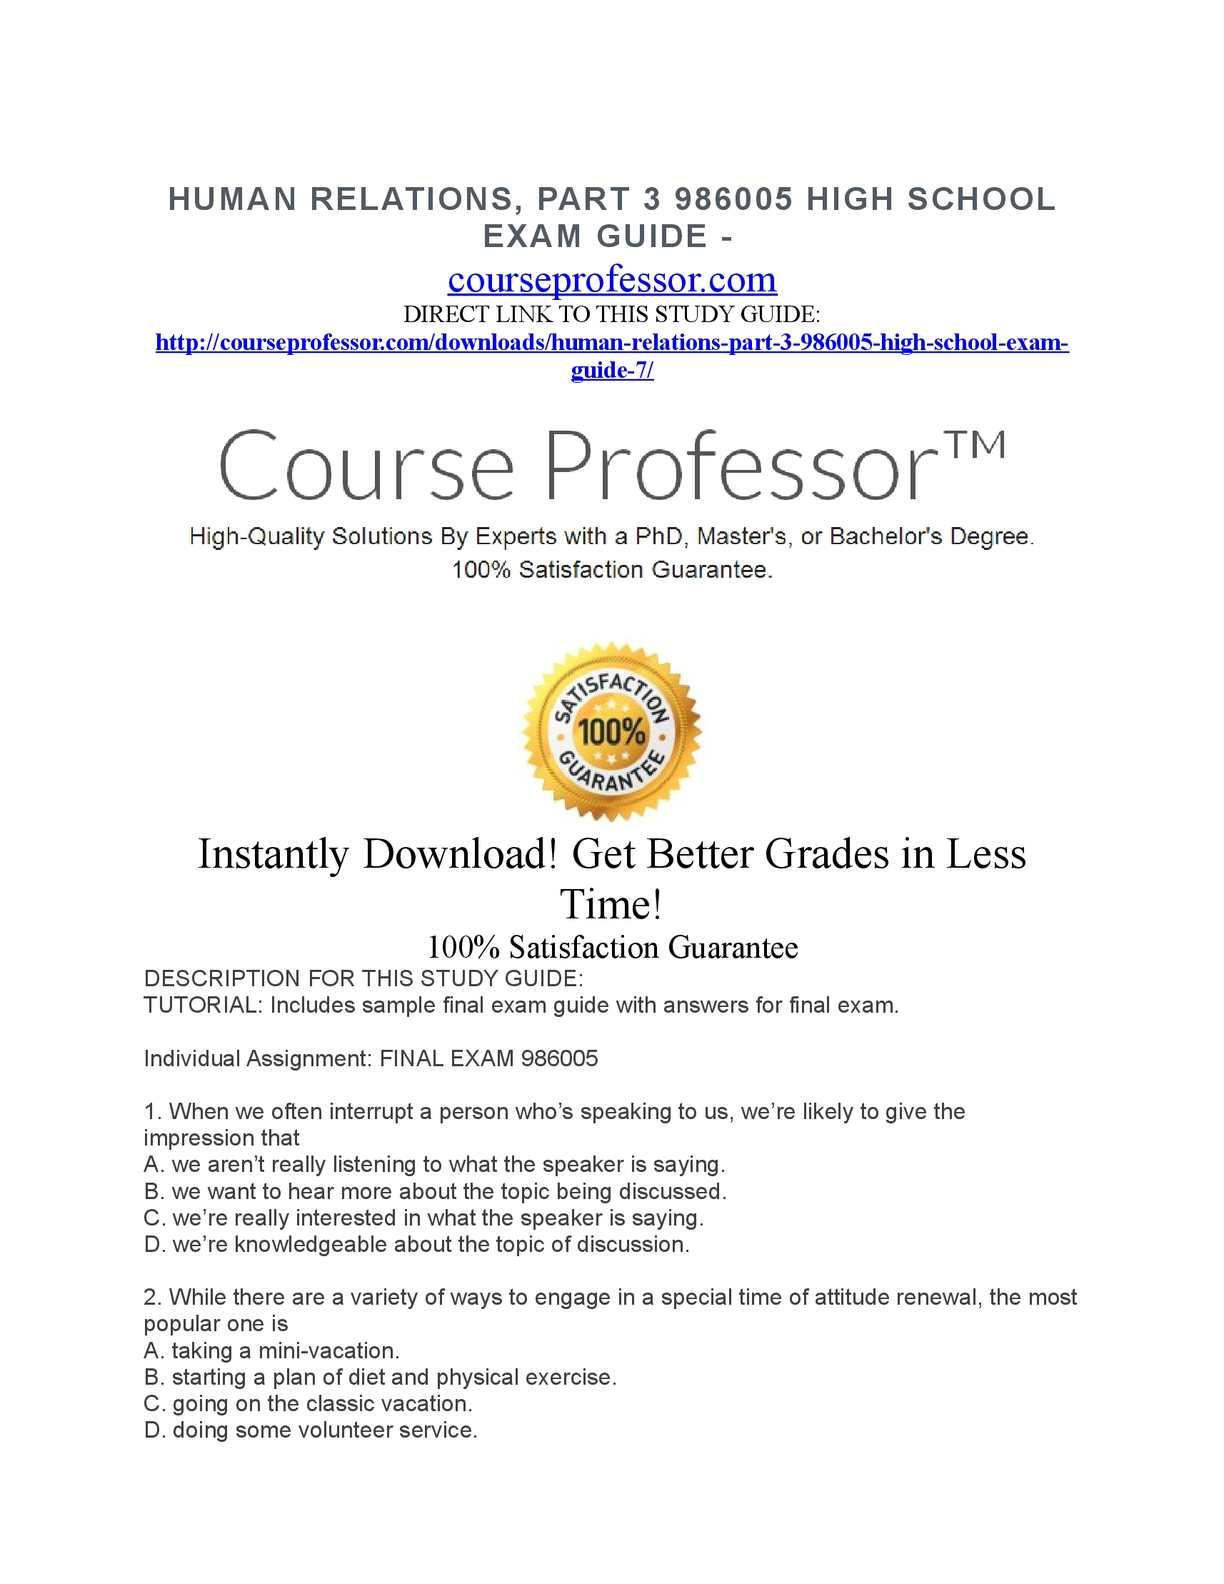 calaméo human relations part 3 986005 high school exam guide